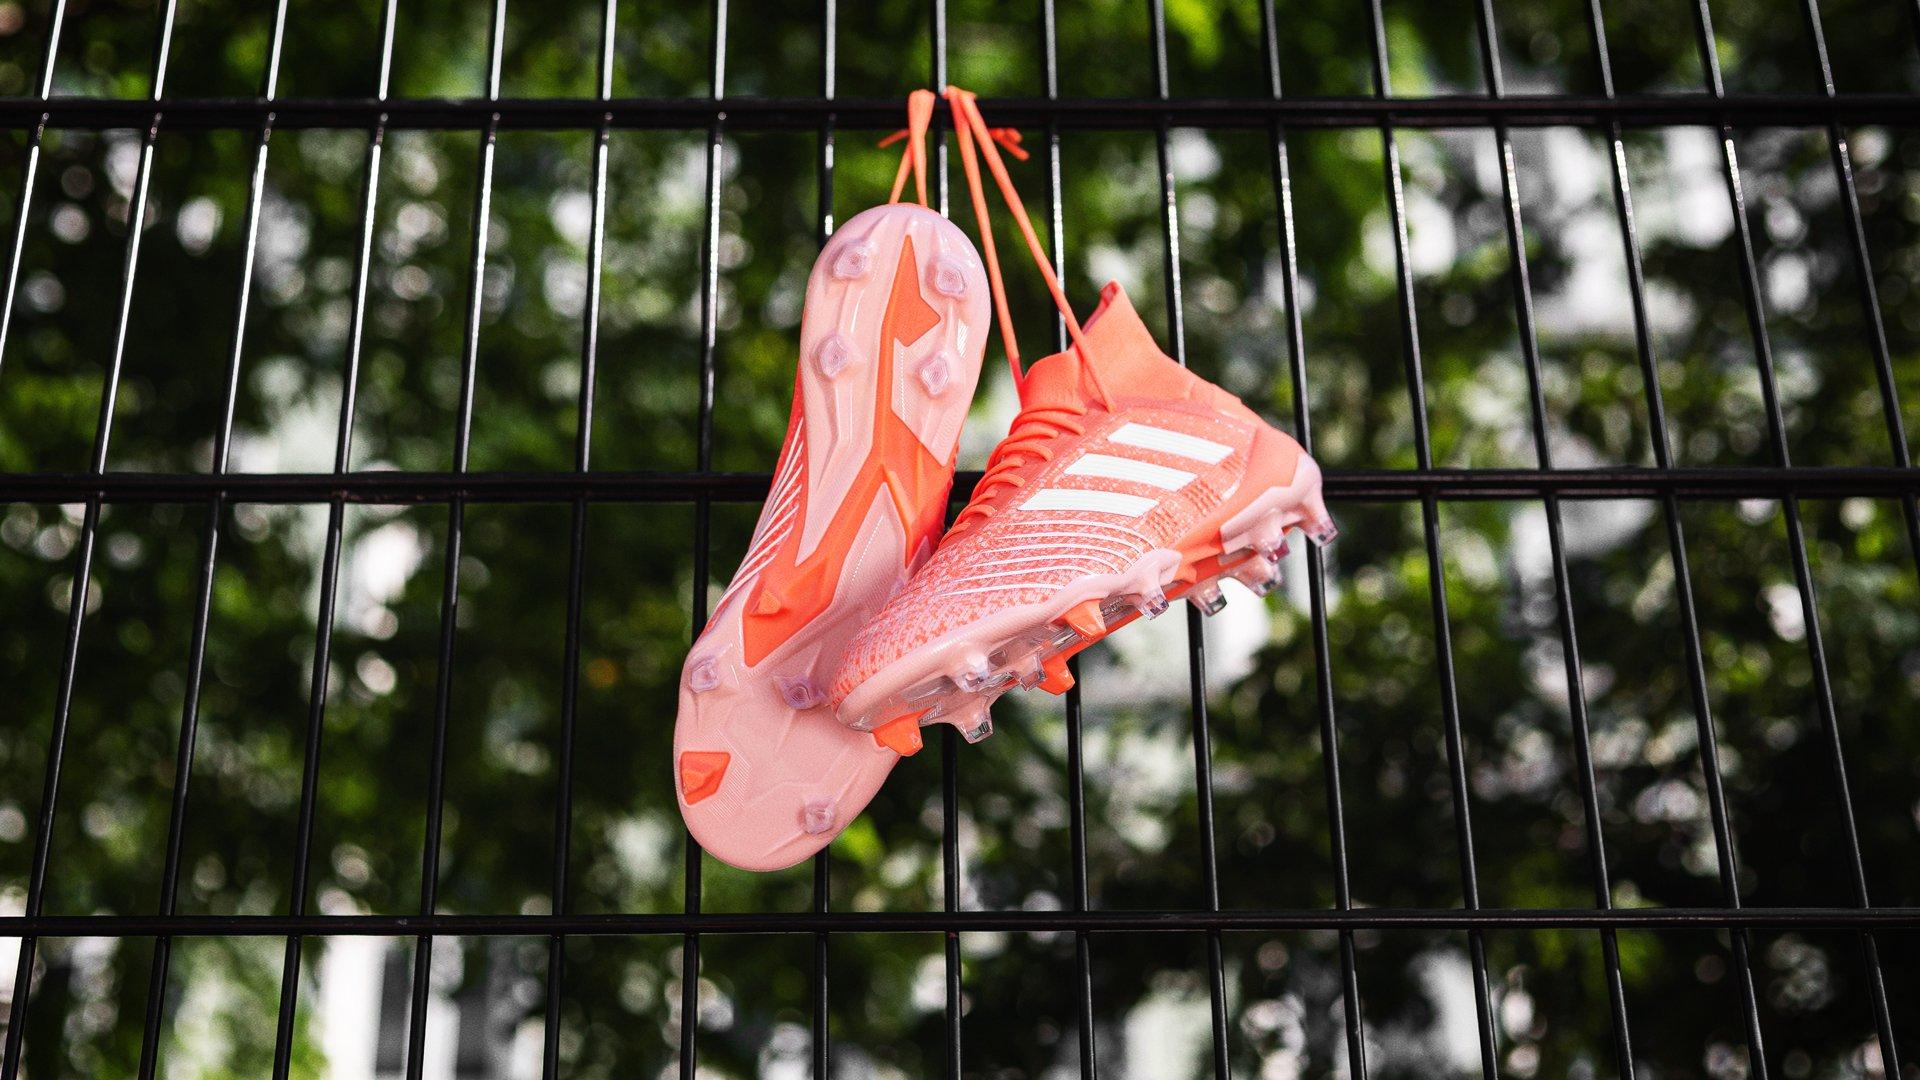 adidas World Cup Pack | Les mer om skoene hos Unisport |